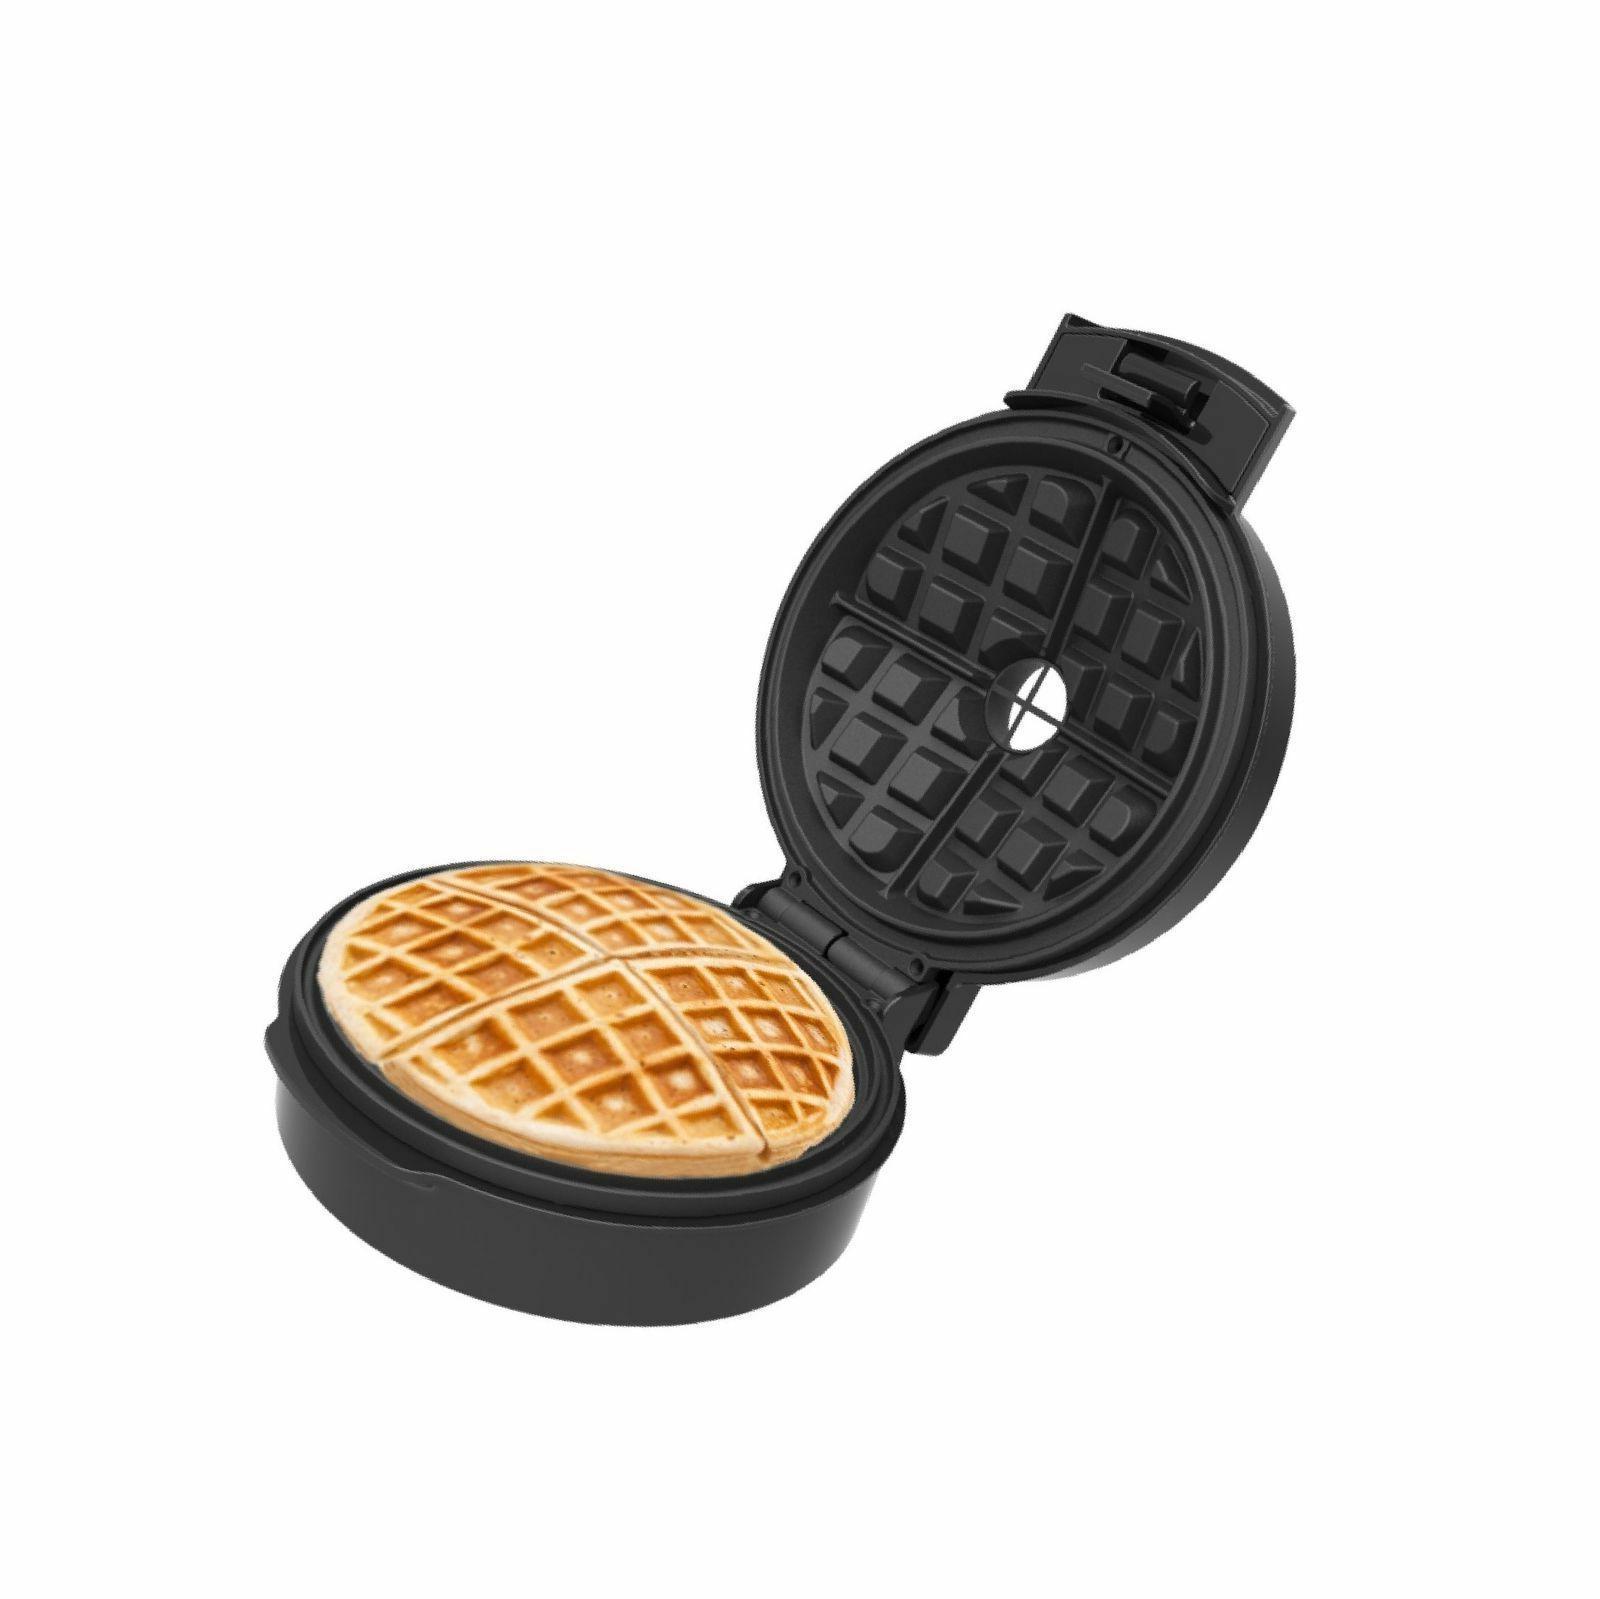 Chefman Waffle